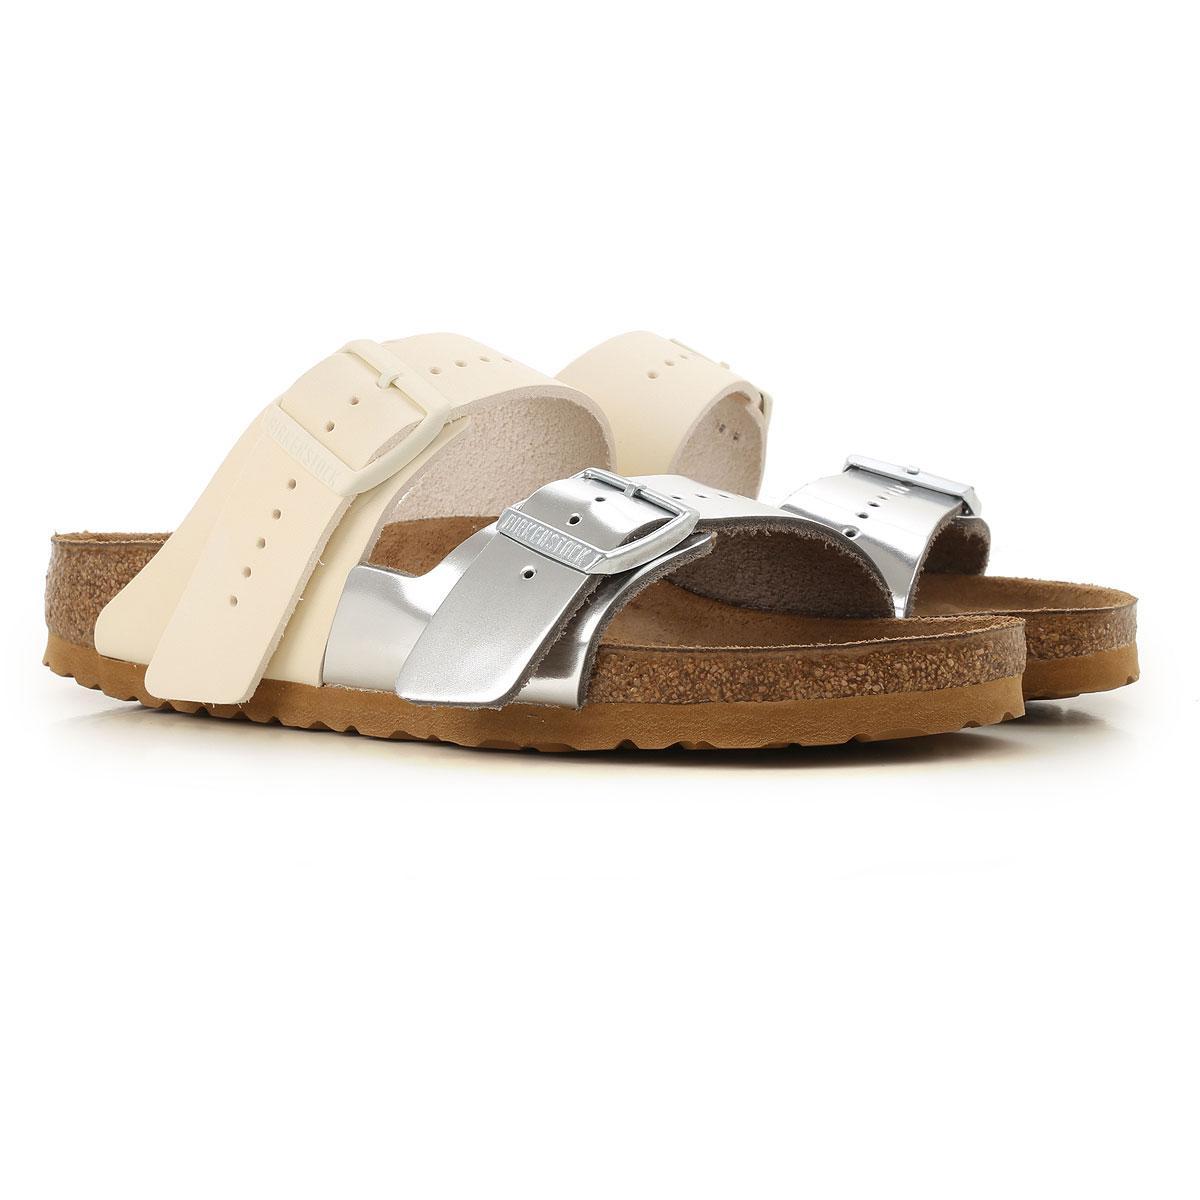 69c8a1adb187 Lyst - Rick Owens Shoes For Women